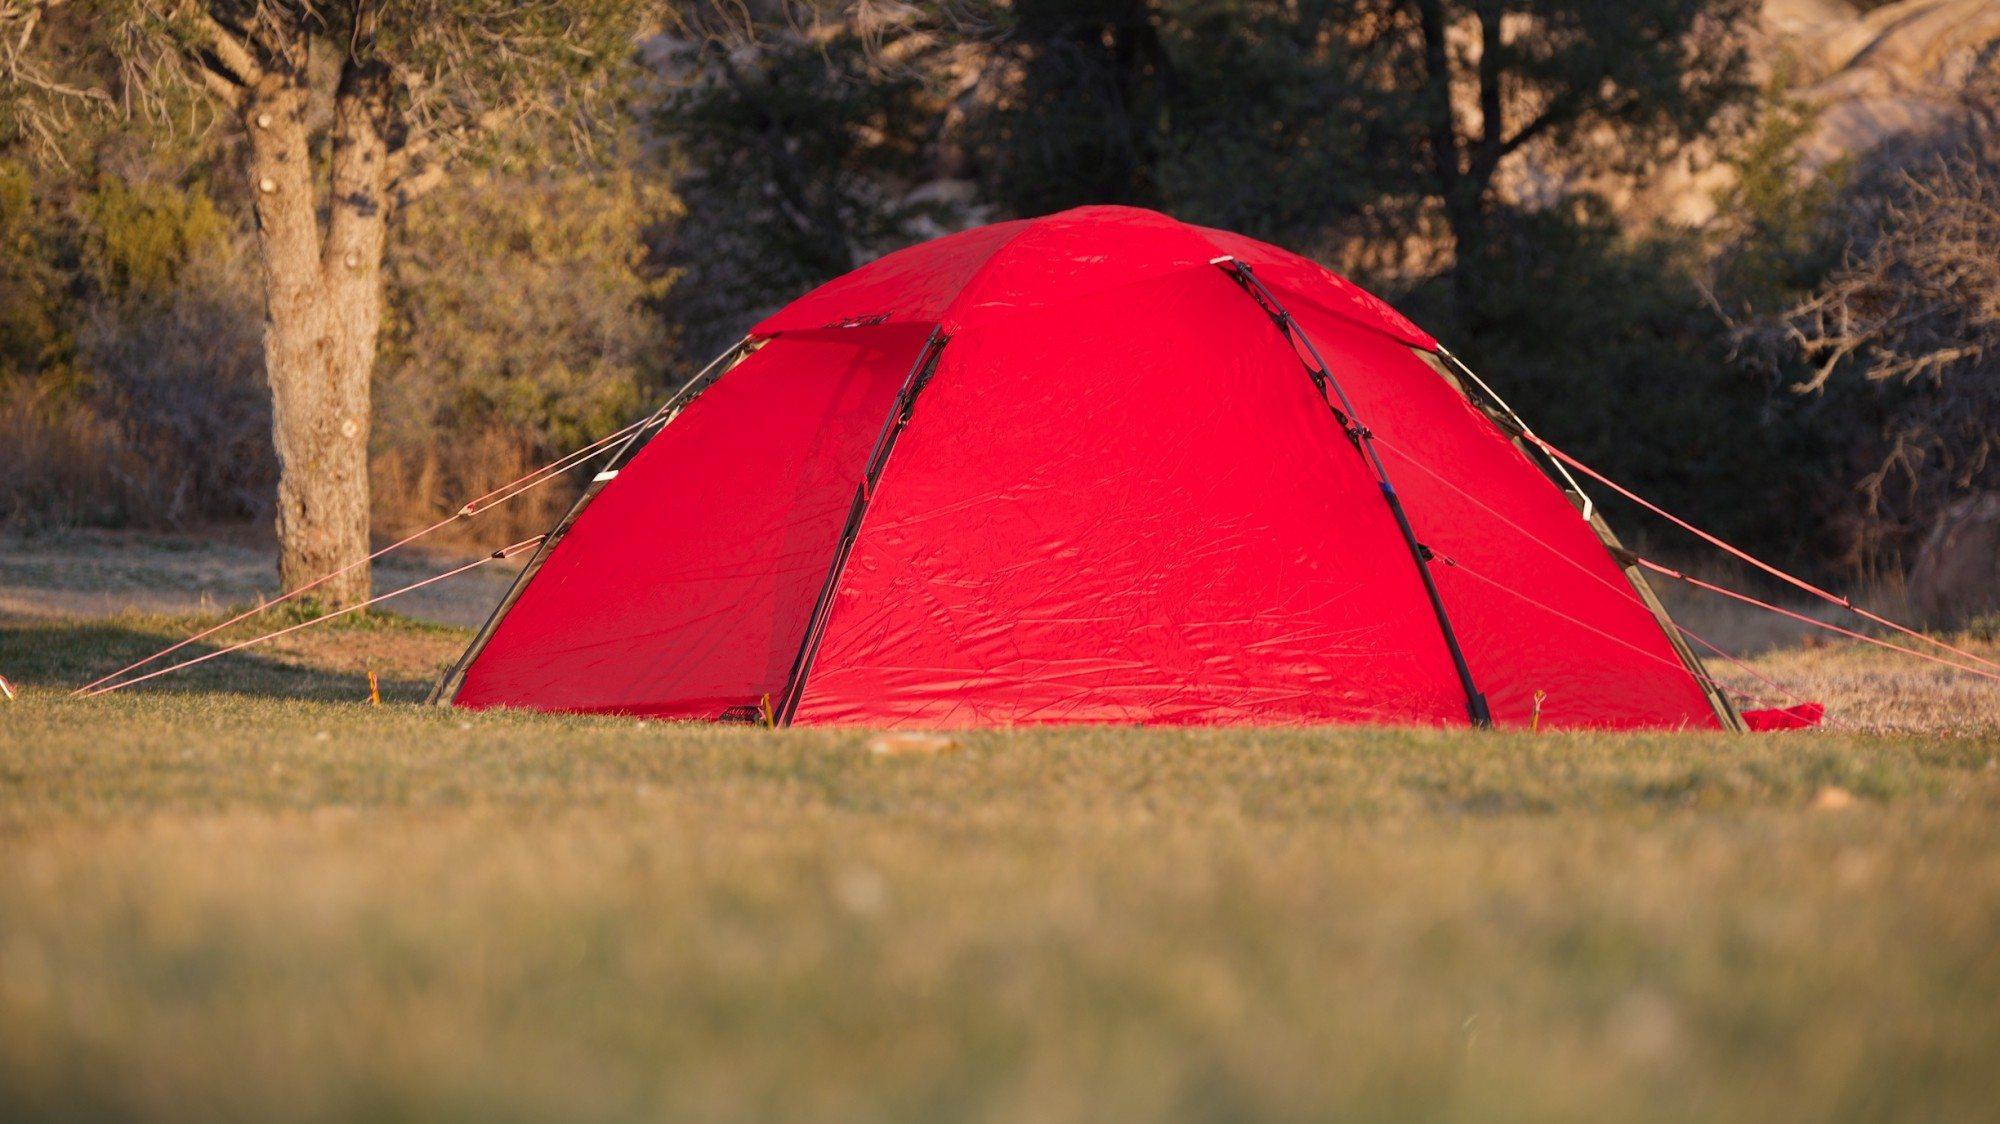 DSCF4828 & Field Tested: Hilleberg Staika 2P Tent u2013 Expedition Portal